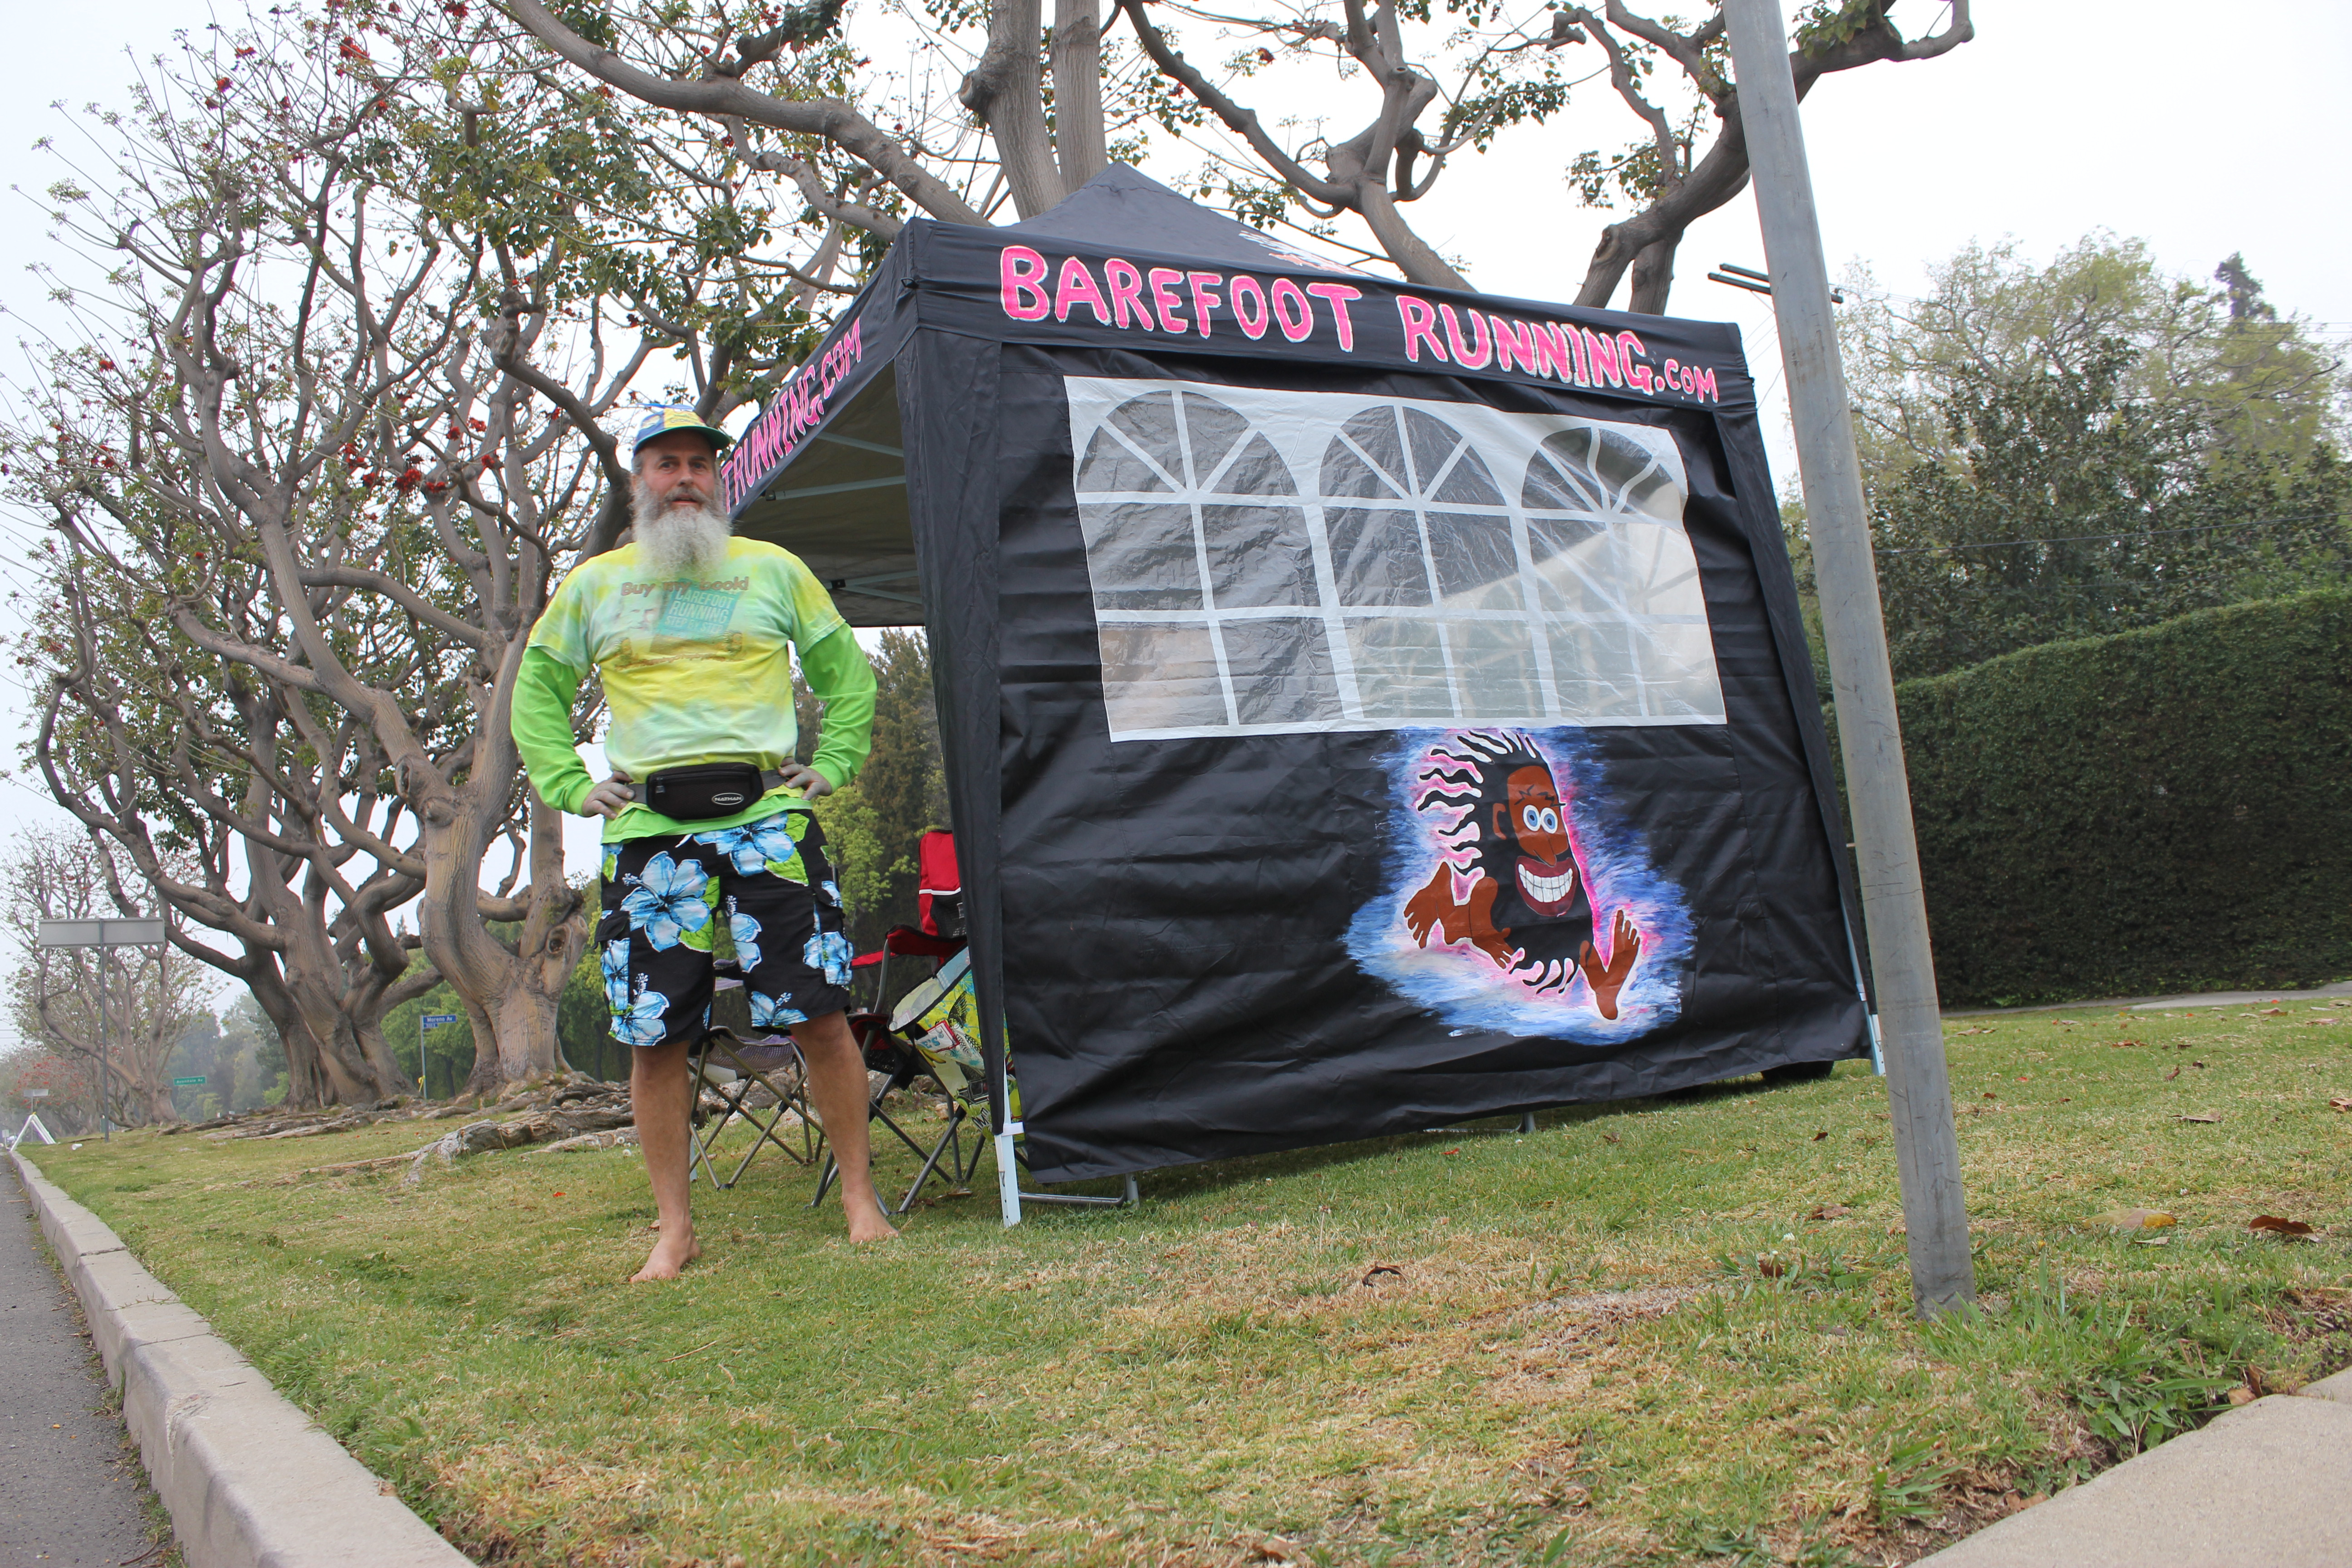 2013 Los Angeles Marathon BarefootRunning.com canopy